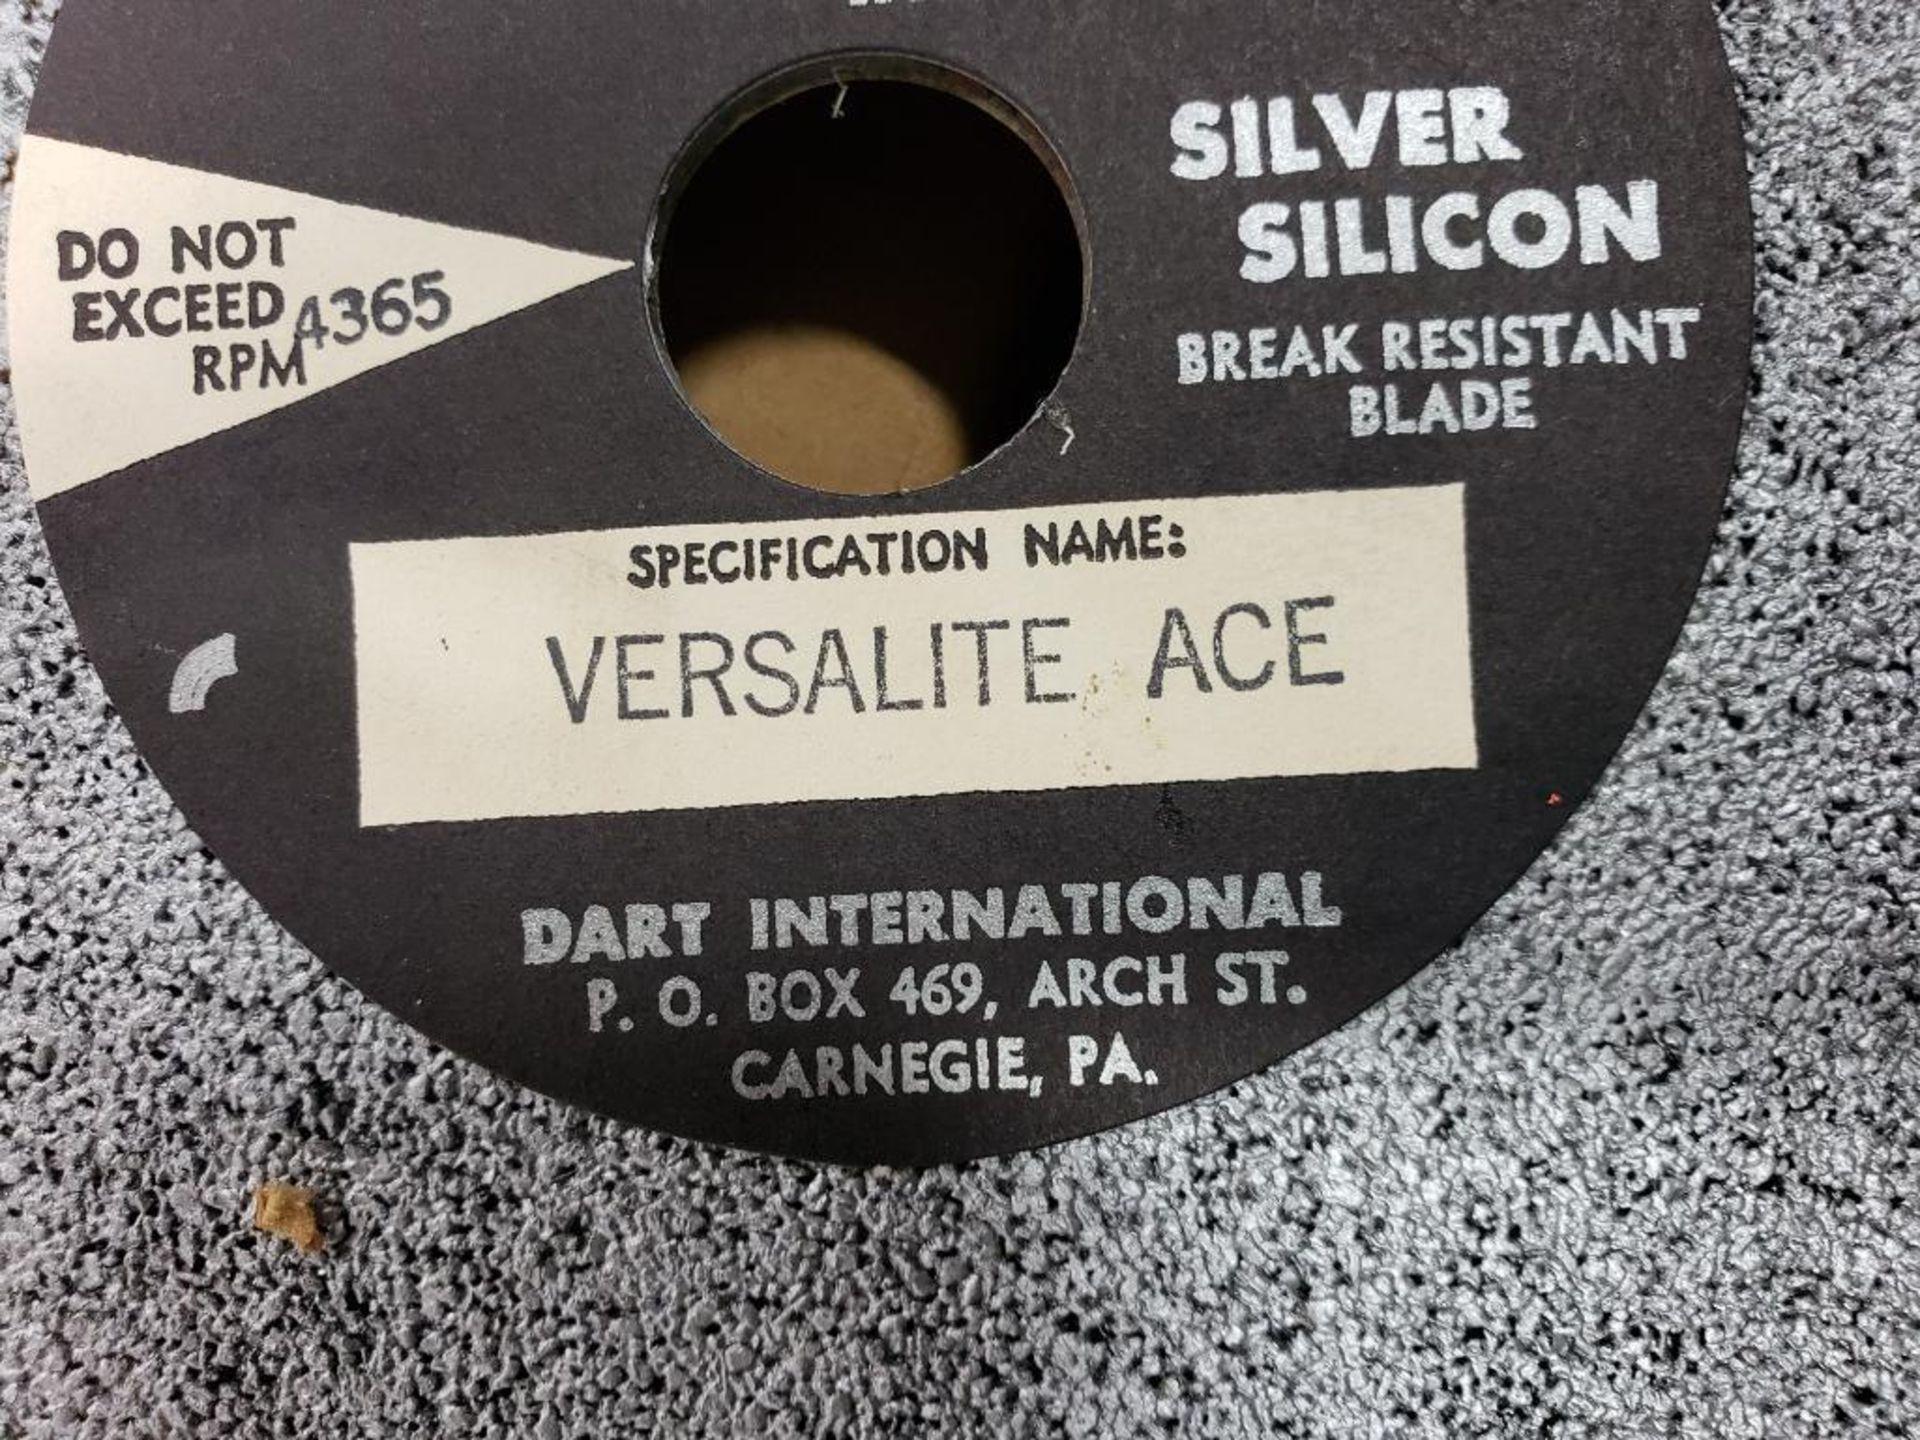 Dart International Silver Silicon break resistant grinding wheels. Versalite Ace. - Image 3 of 4